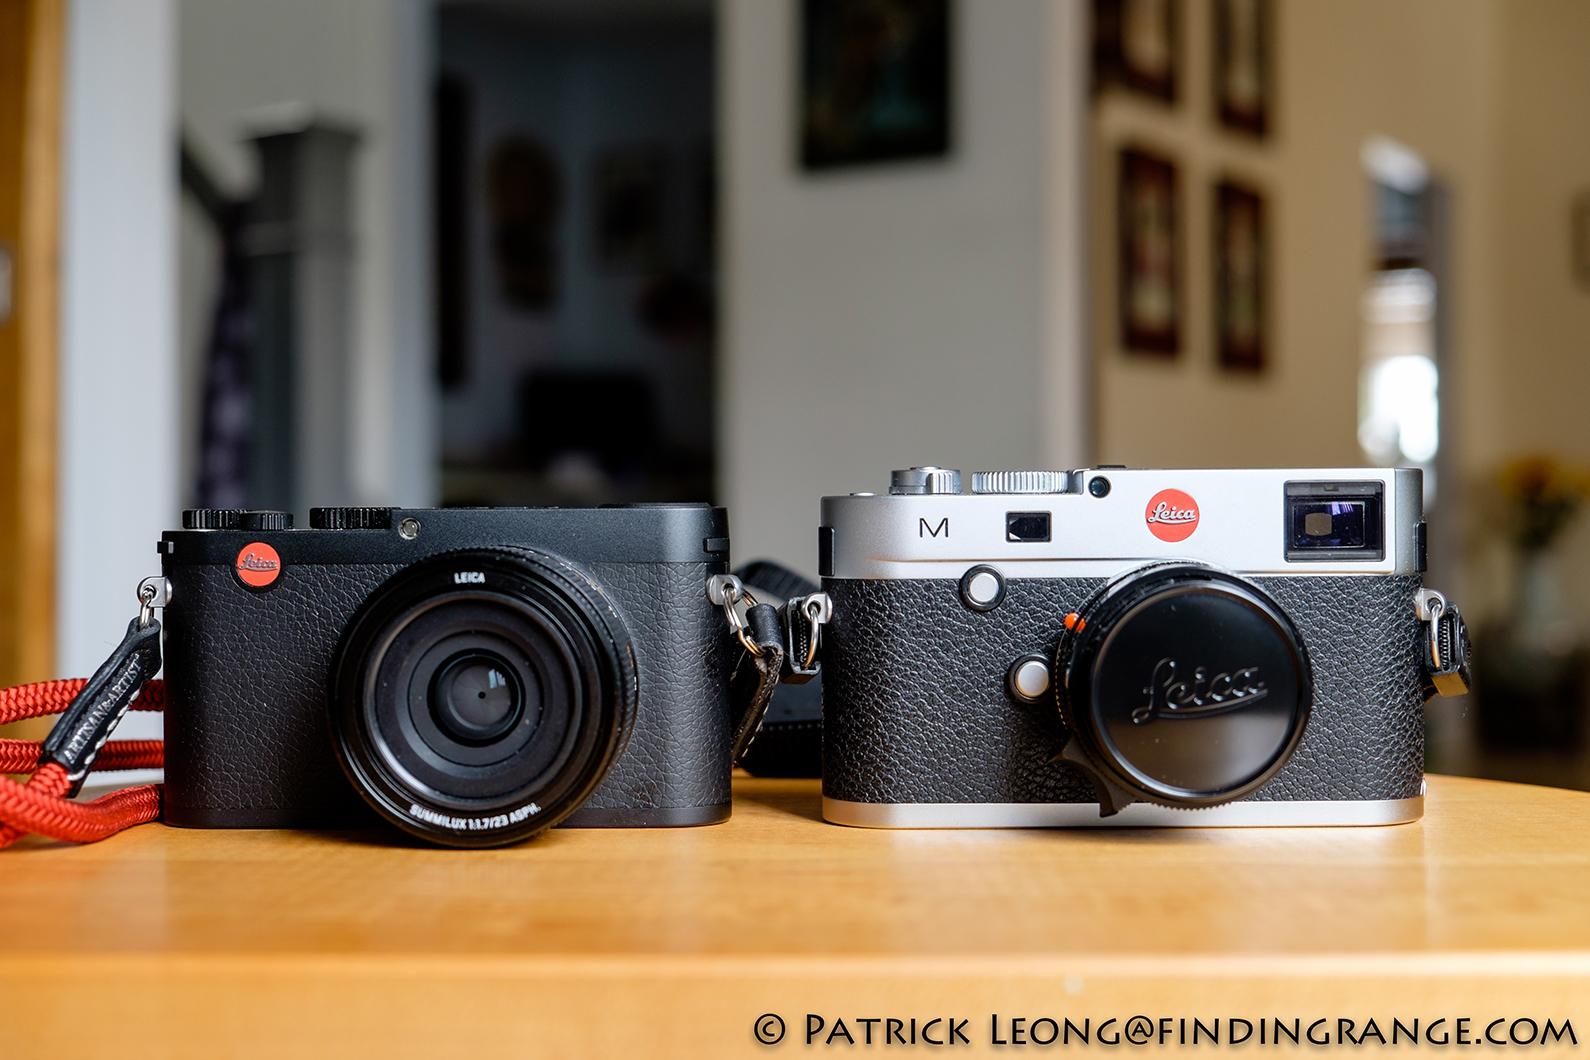 Leica-X-Typ-113-vs-Leica-M-Typ-